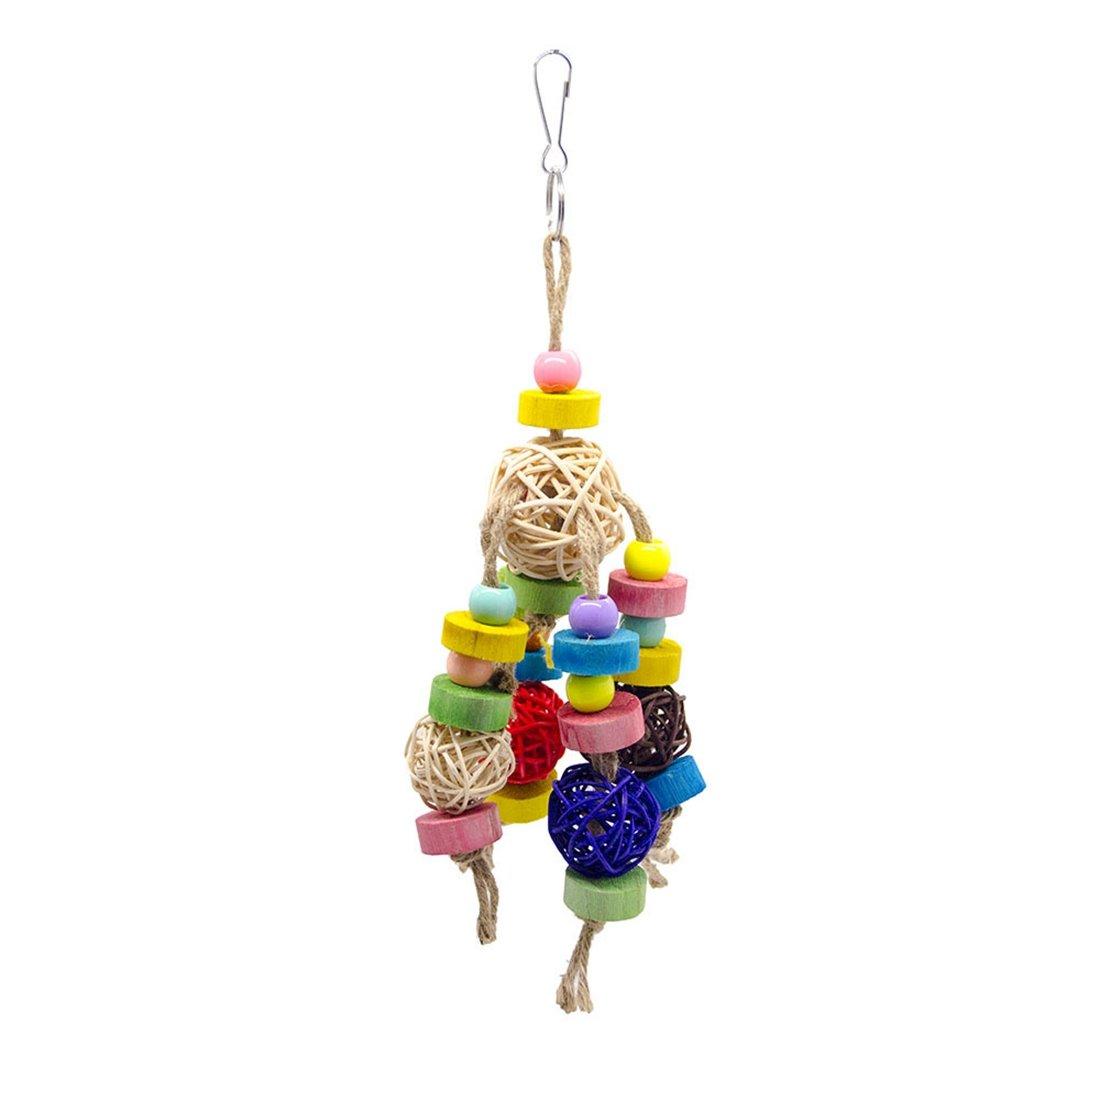 Multicolor 308cm Multicolor 308cm Huayue Parred Toys Biological Sepak Takraw Bird Toy Parreds Chew Bite Toy Cage Accoutrement (color   Multicolor, Size   30  8cm)